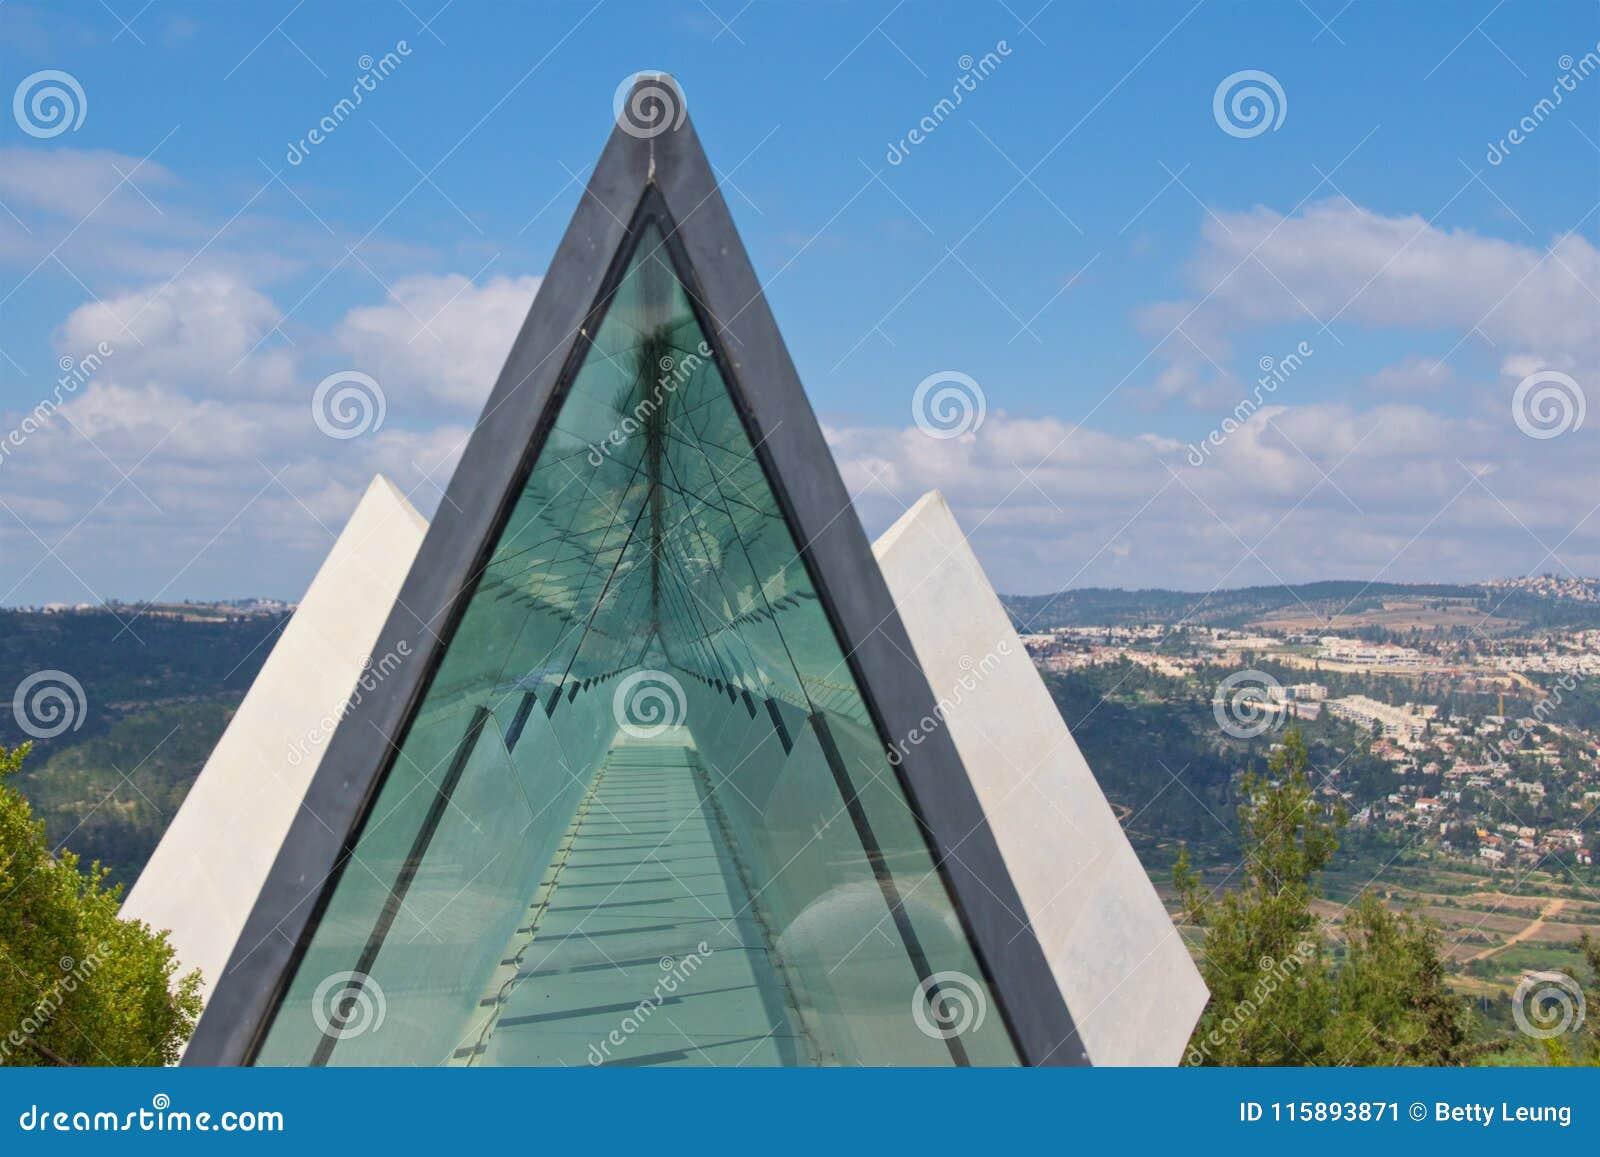 Prism skylight in Yad Vashem Museum in Jerusalem, Israel